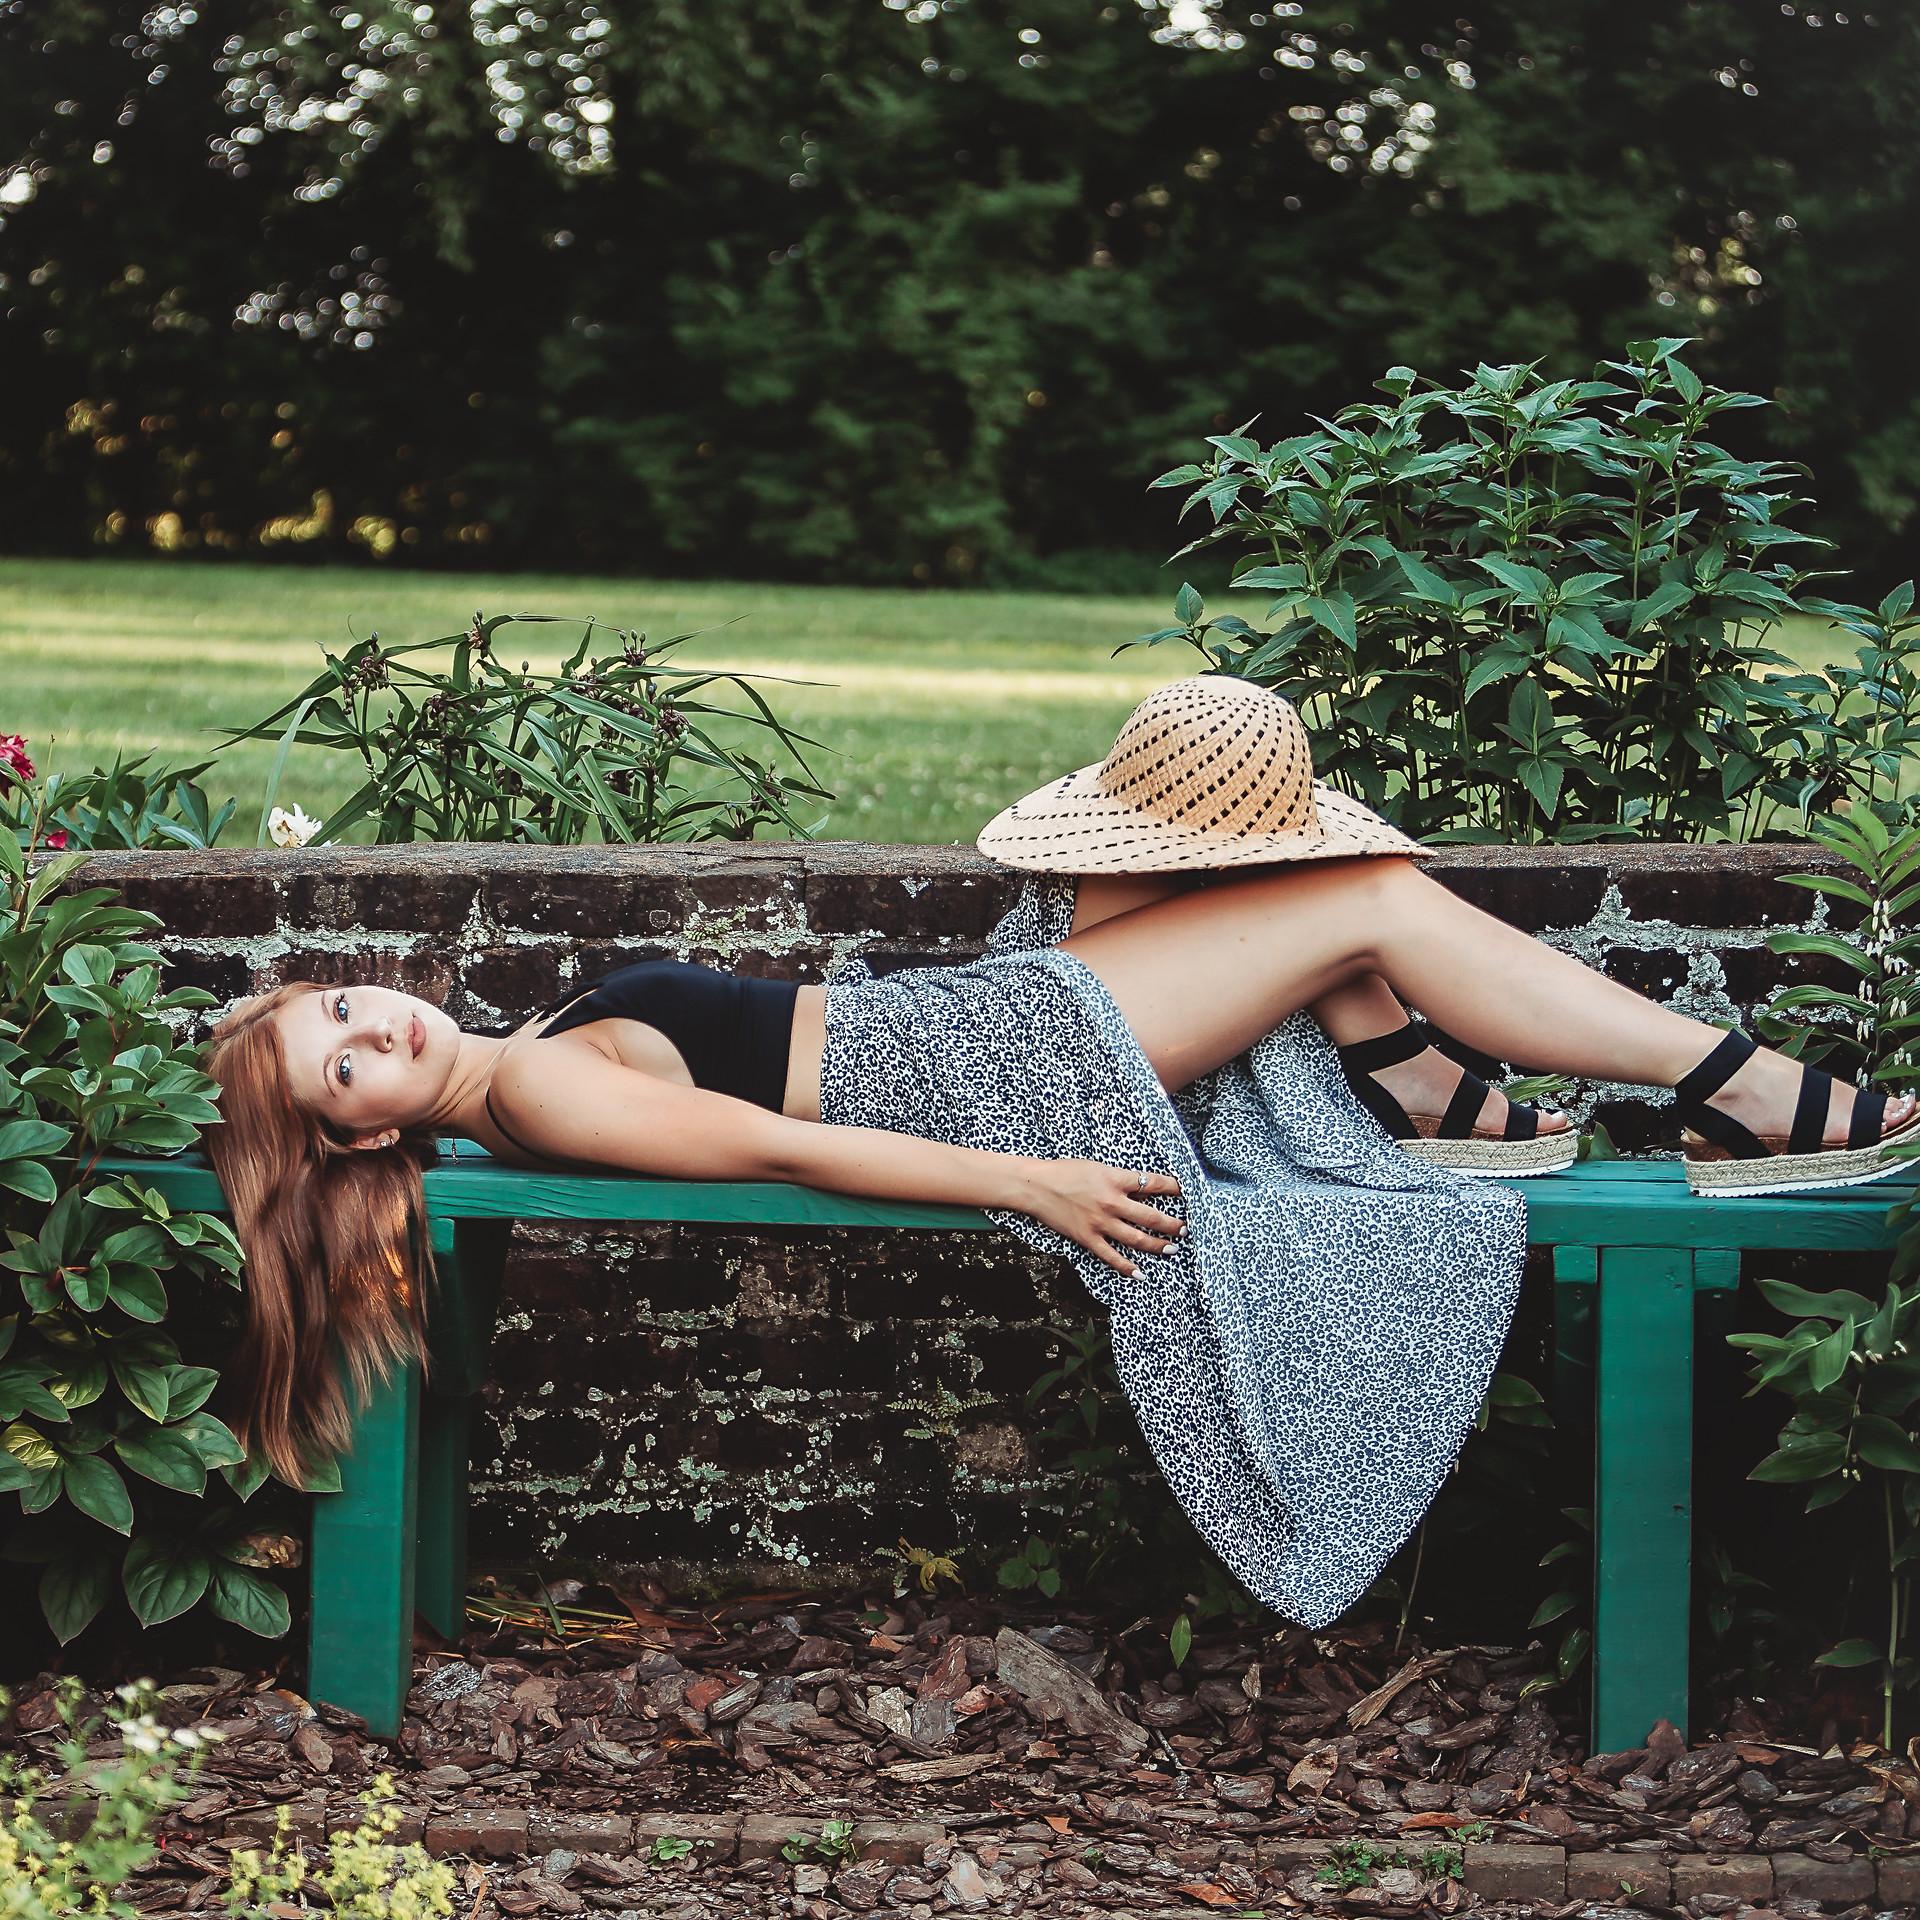 AprilManningPhotography-DylanieBrummer3.